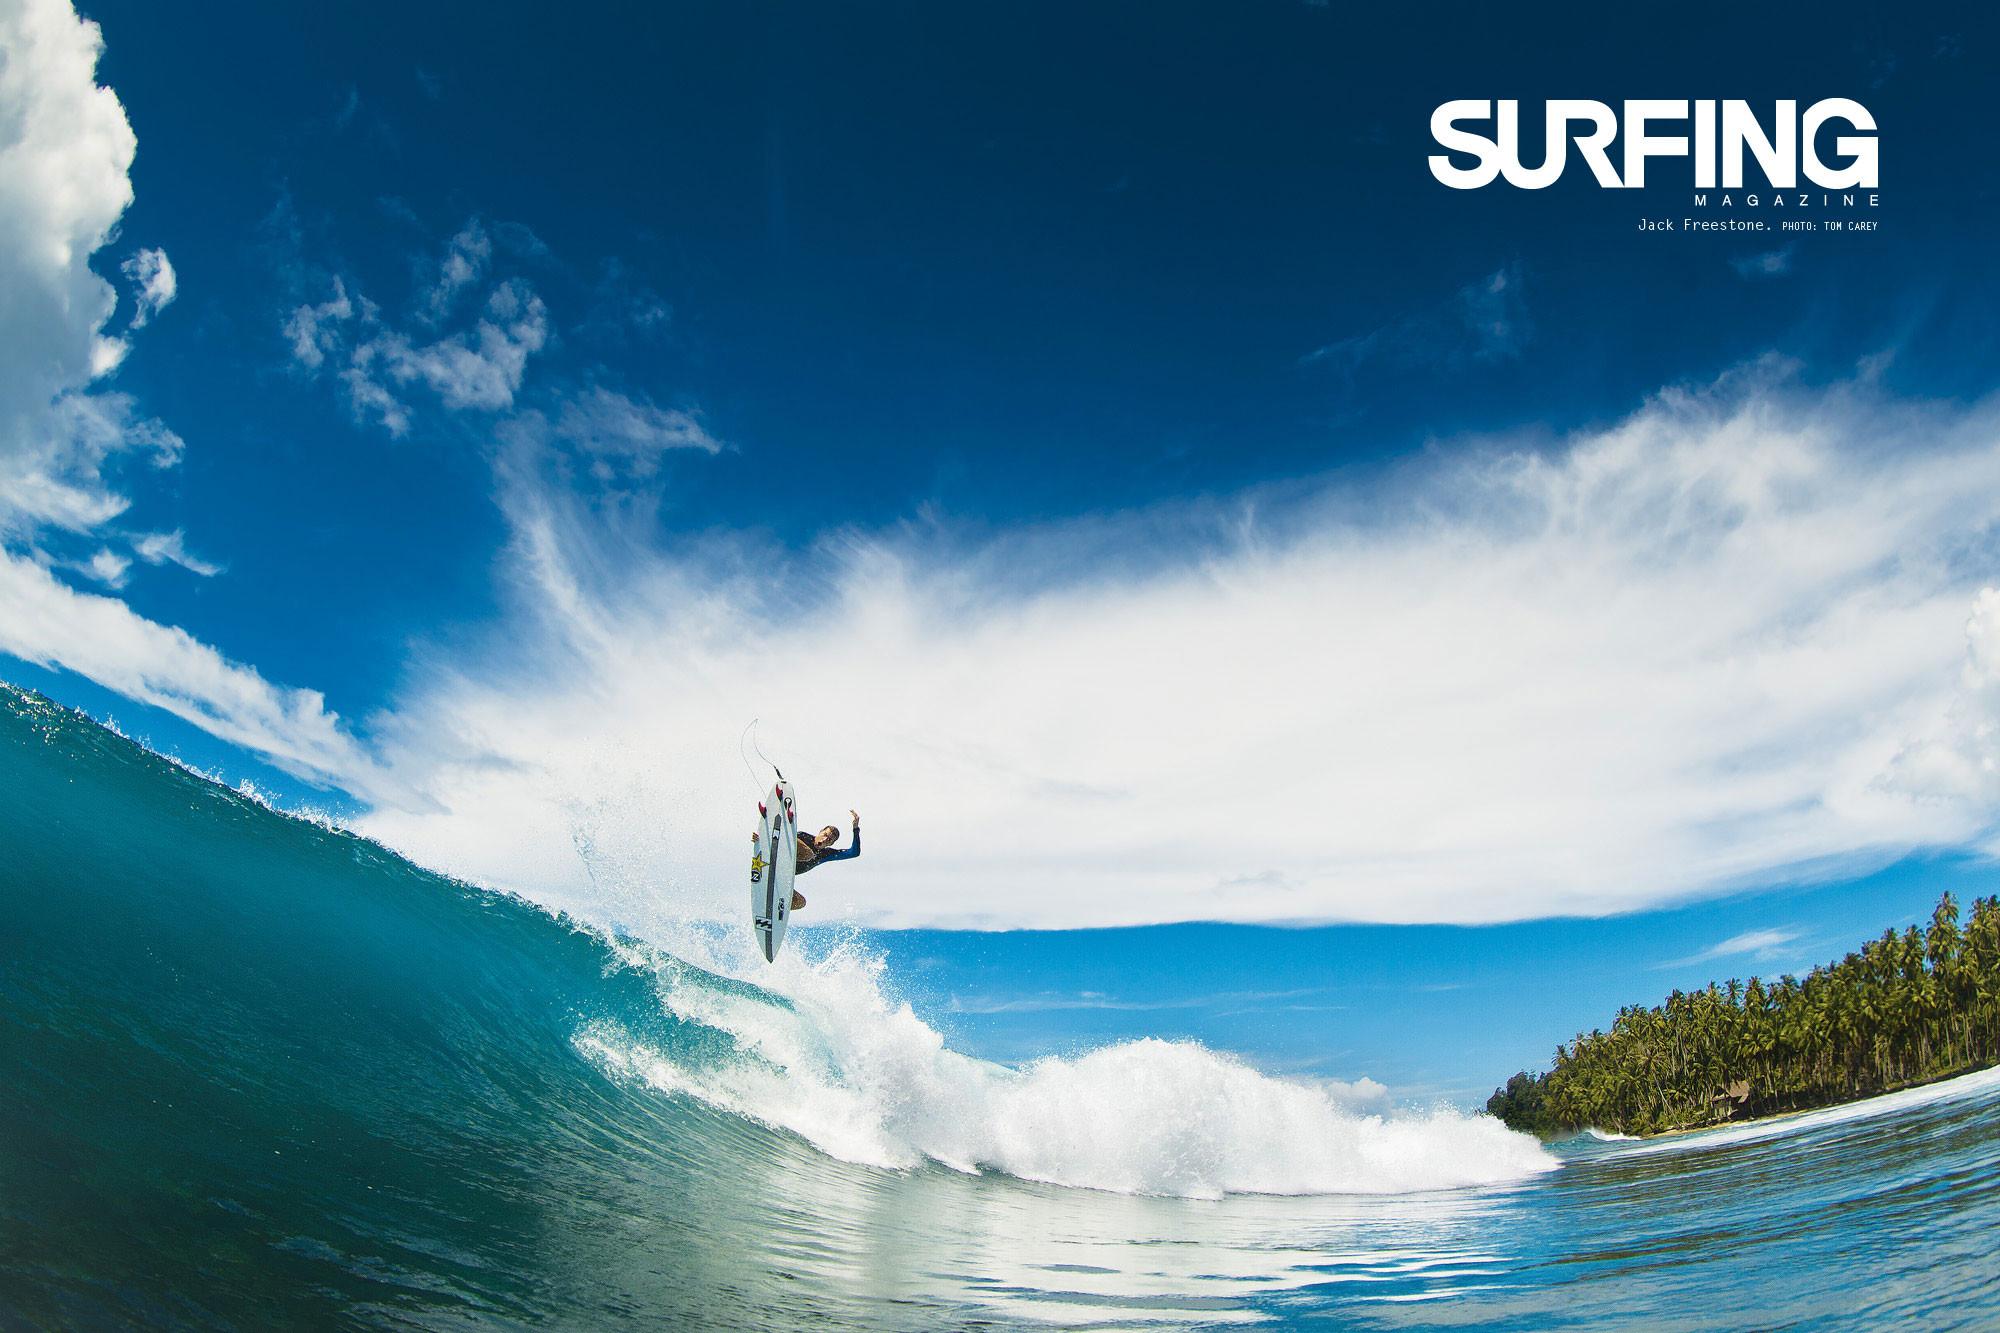 SURFING Wallpaper Issue SURFER Magazine   HD Wallpapers   Pinterest   Surfer  magazine, Hd wallpaper and Wallpaper